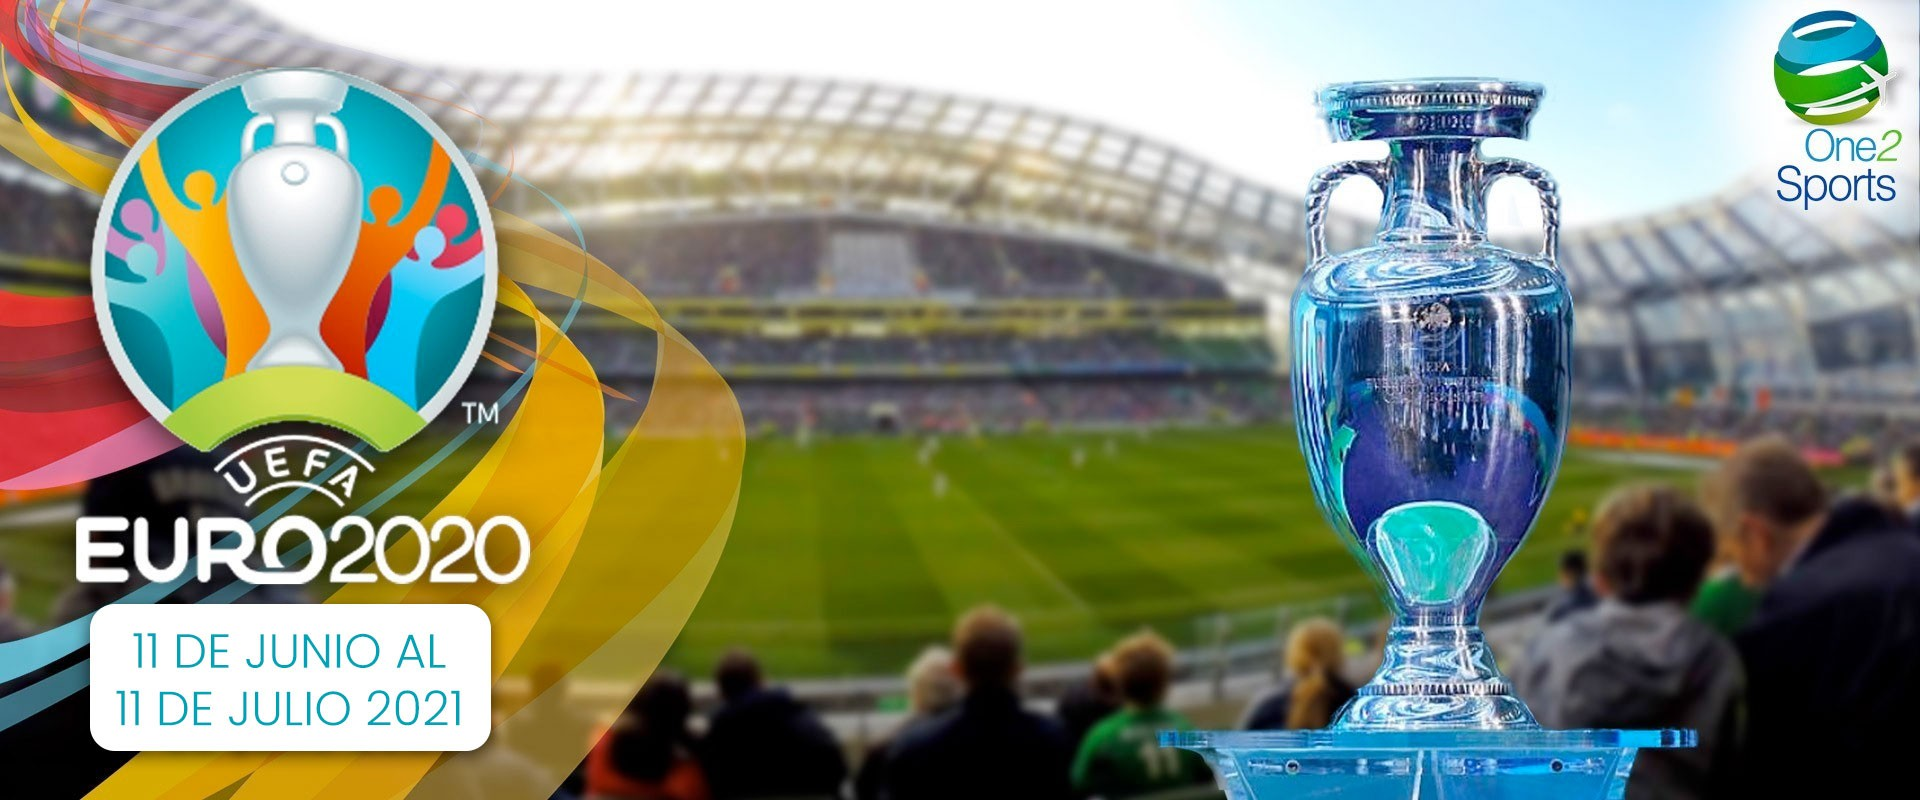 Eurocopa en Dublín